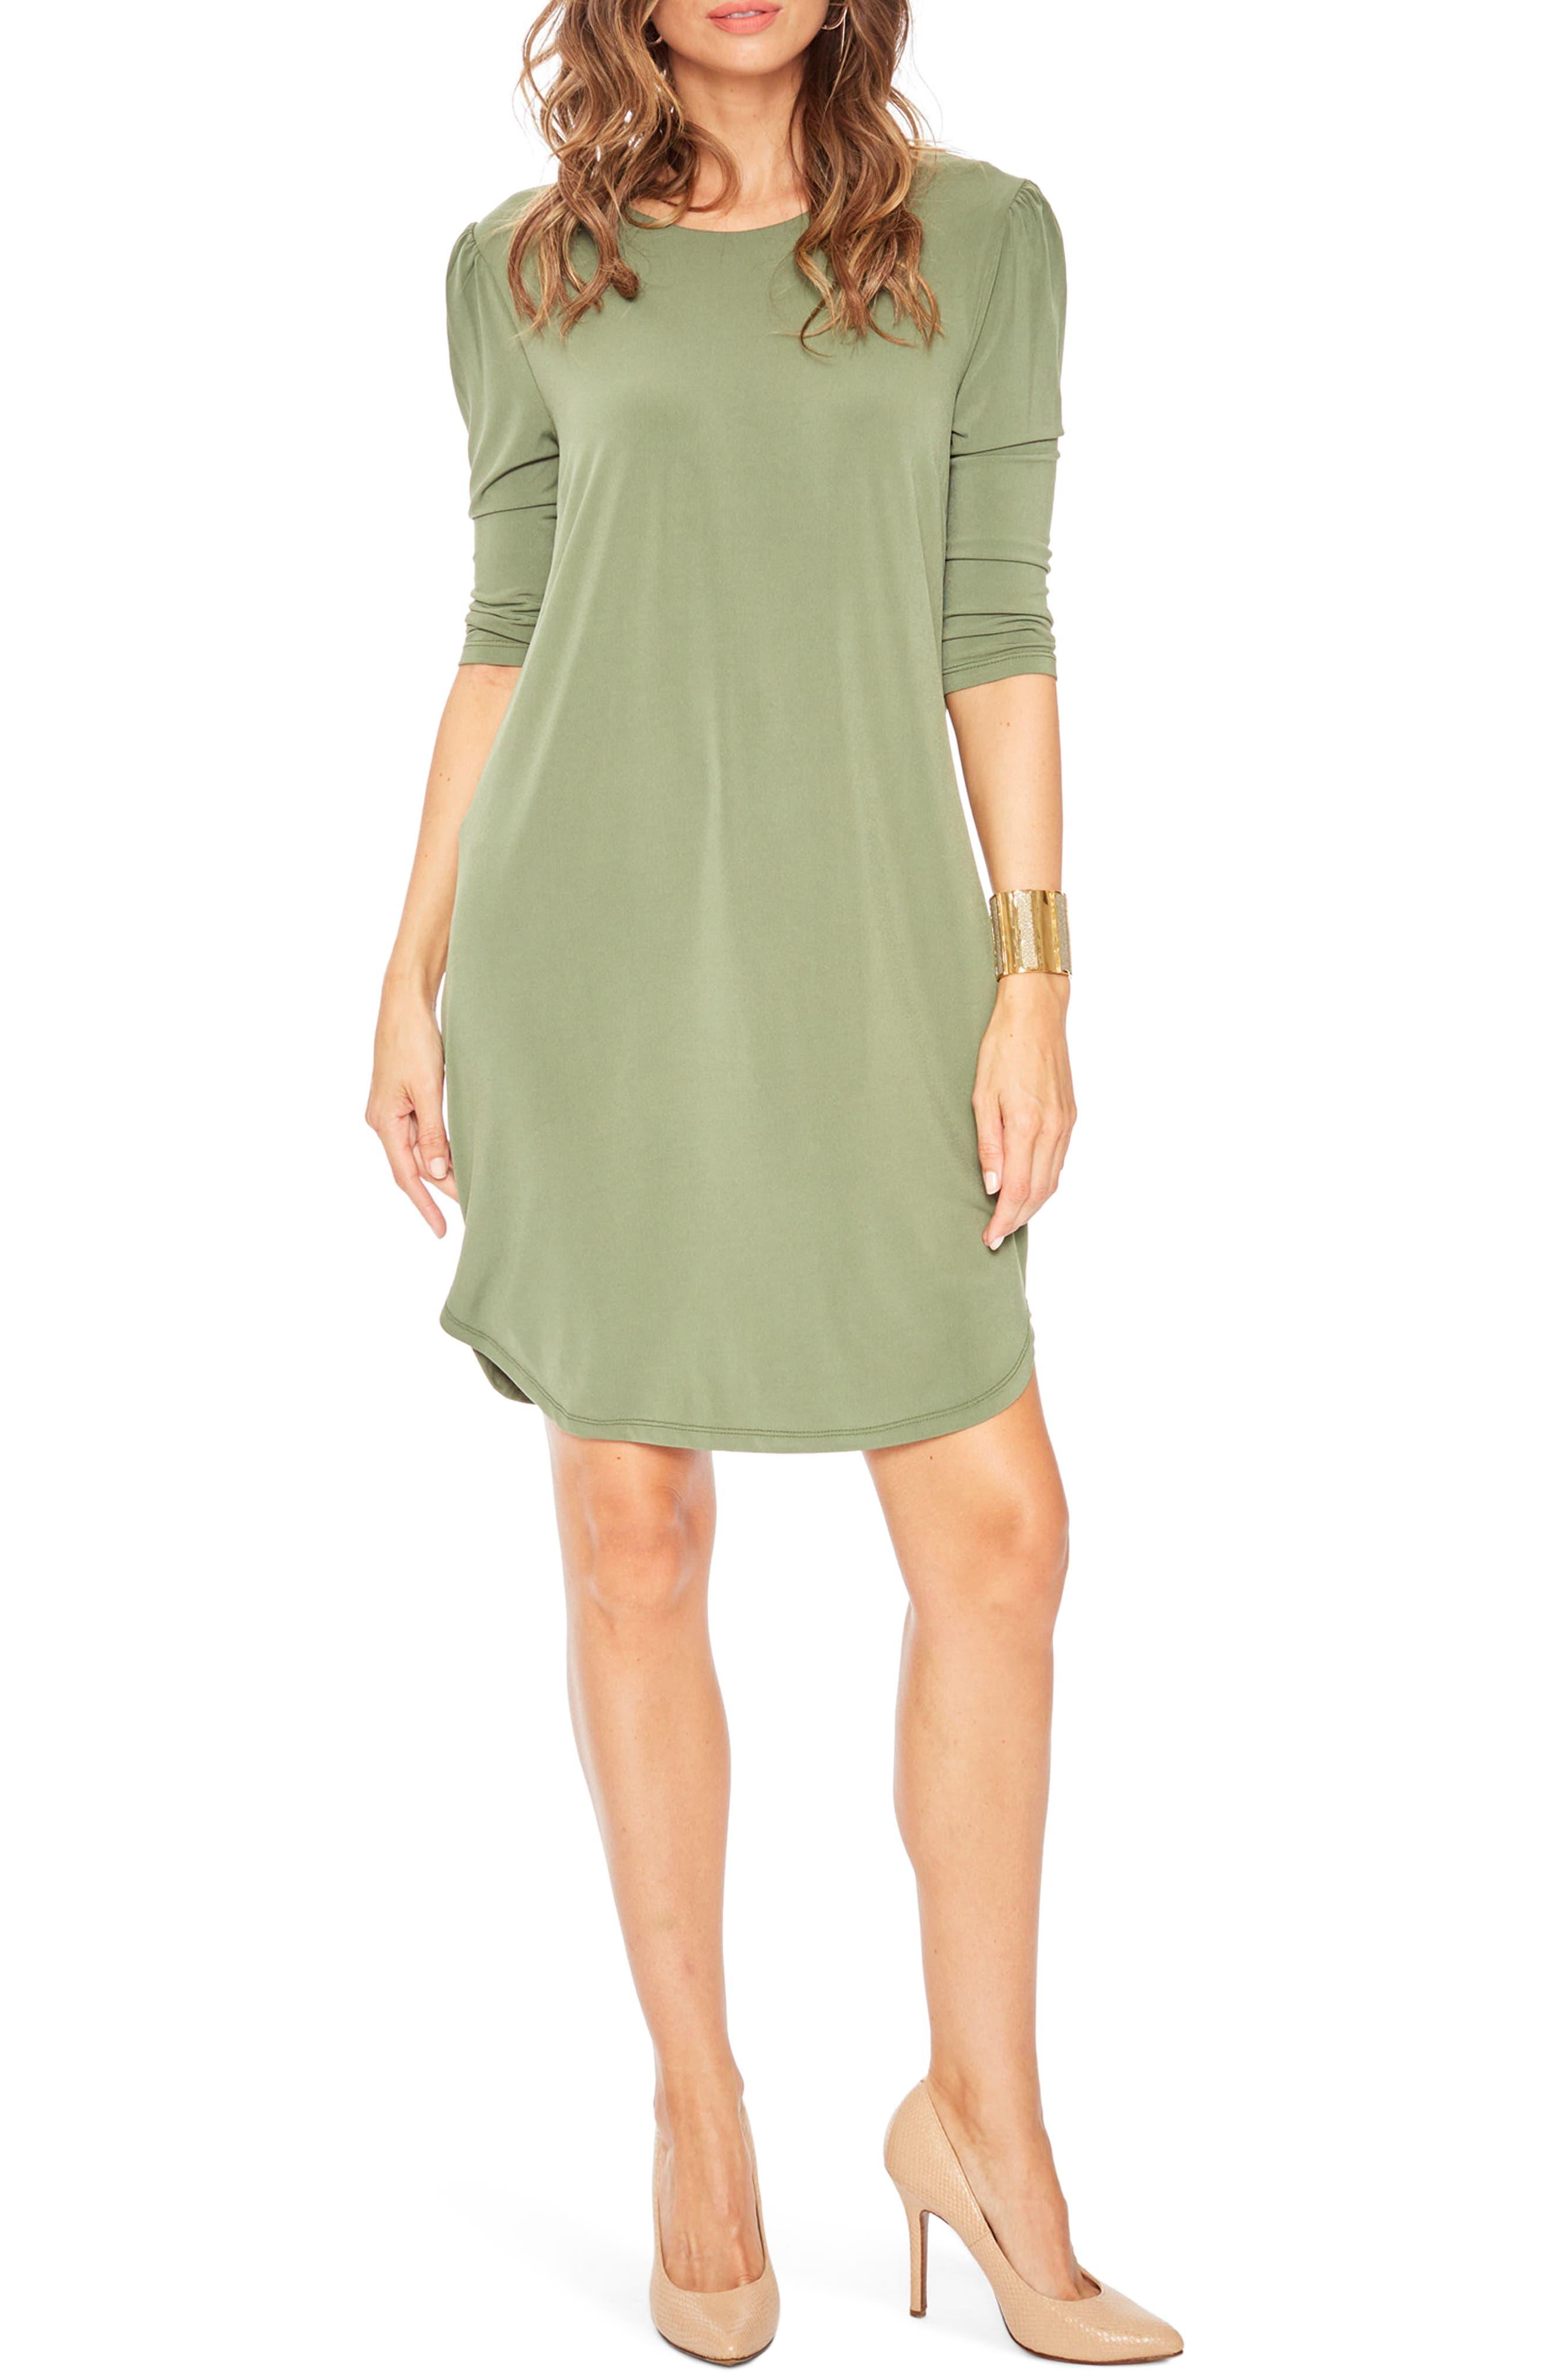 Alternate Image 1 Selected - Rosie Pope Britt Maternity Sheath Dress